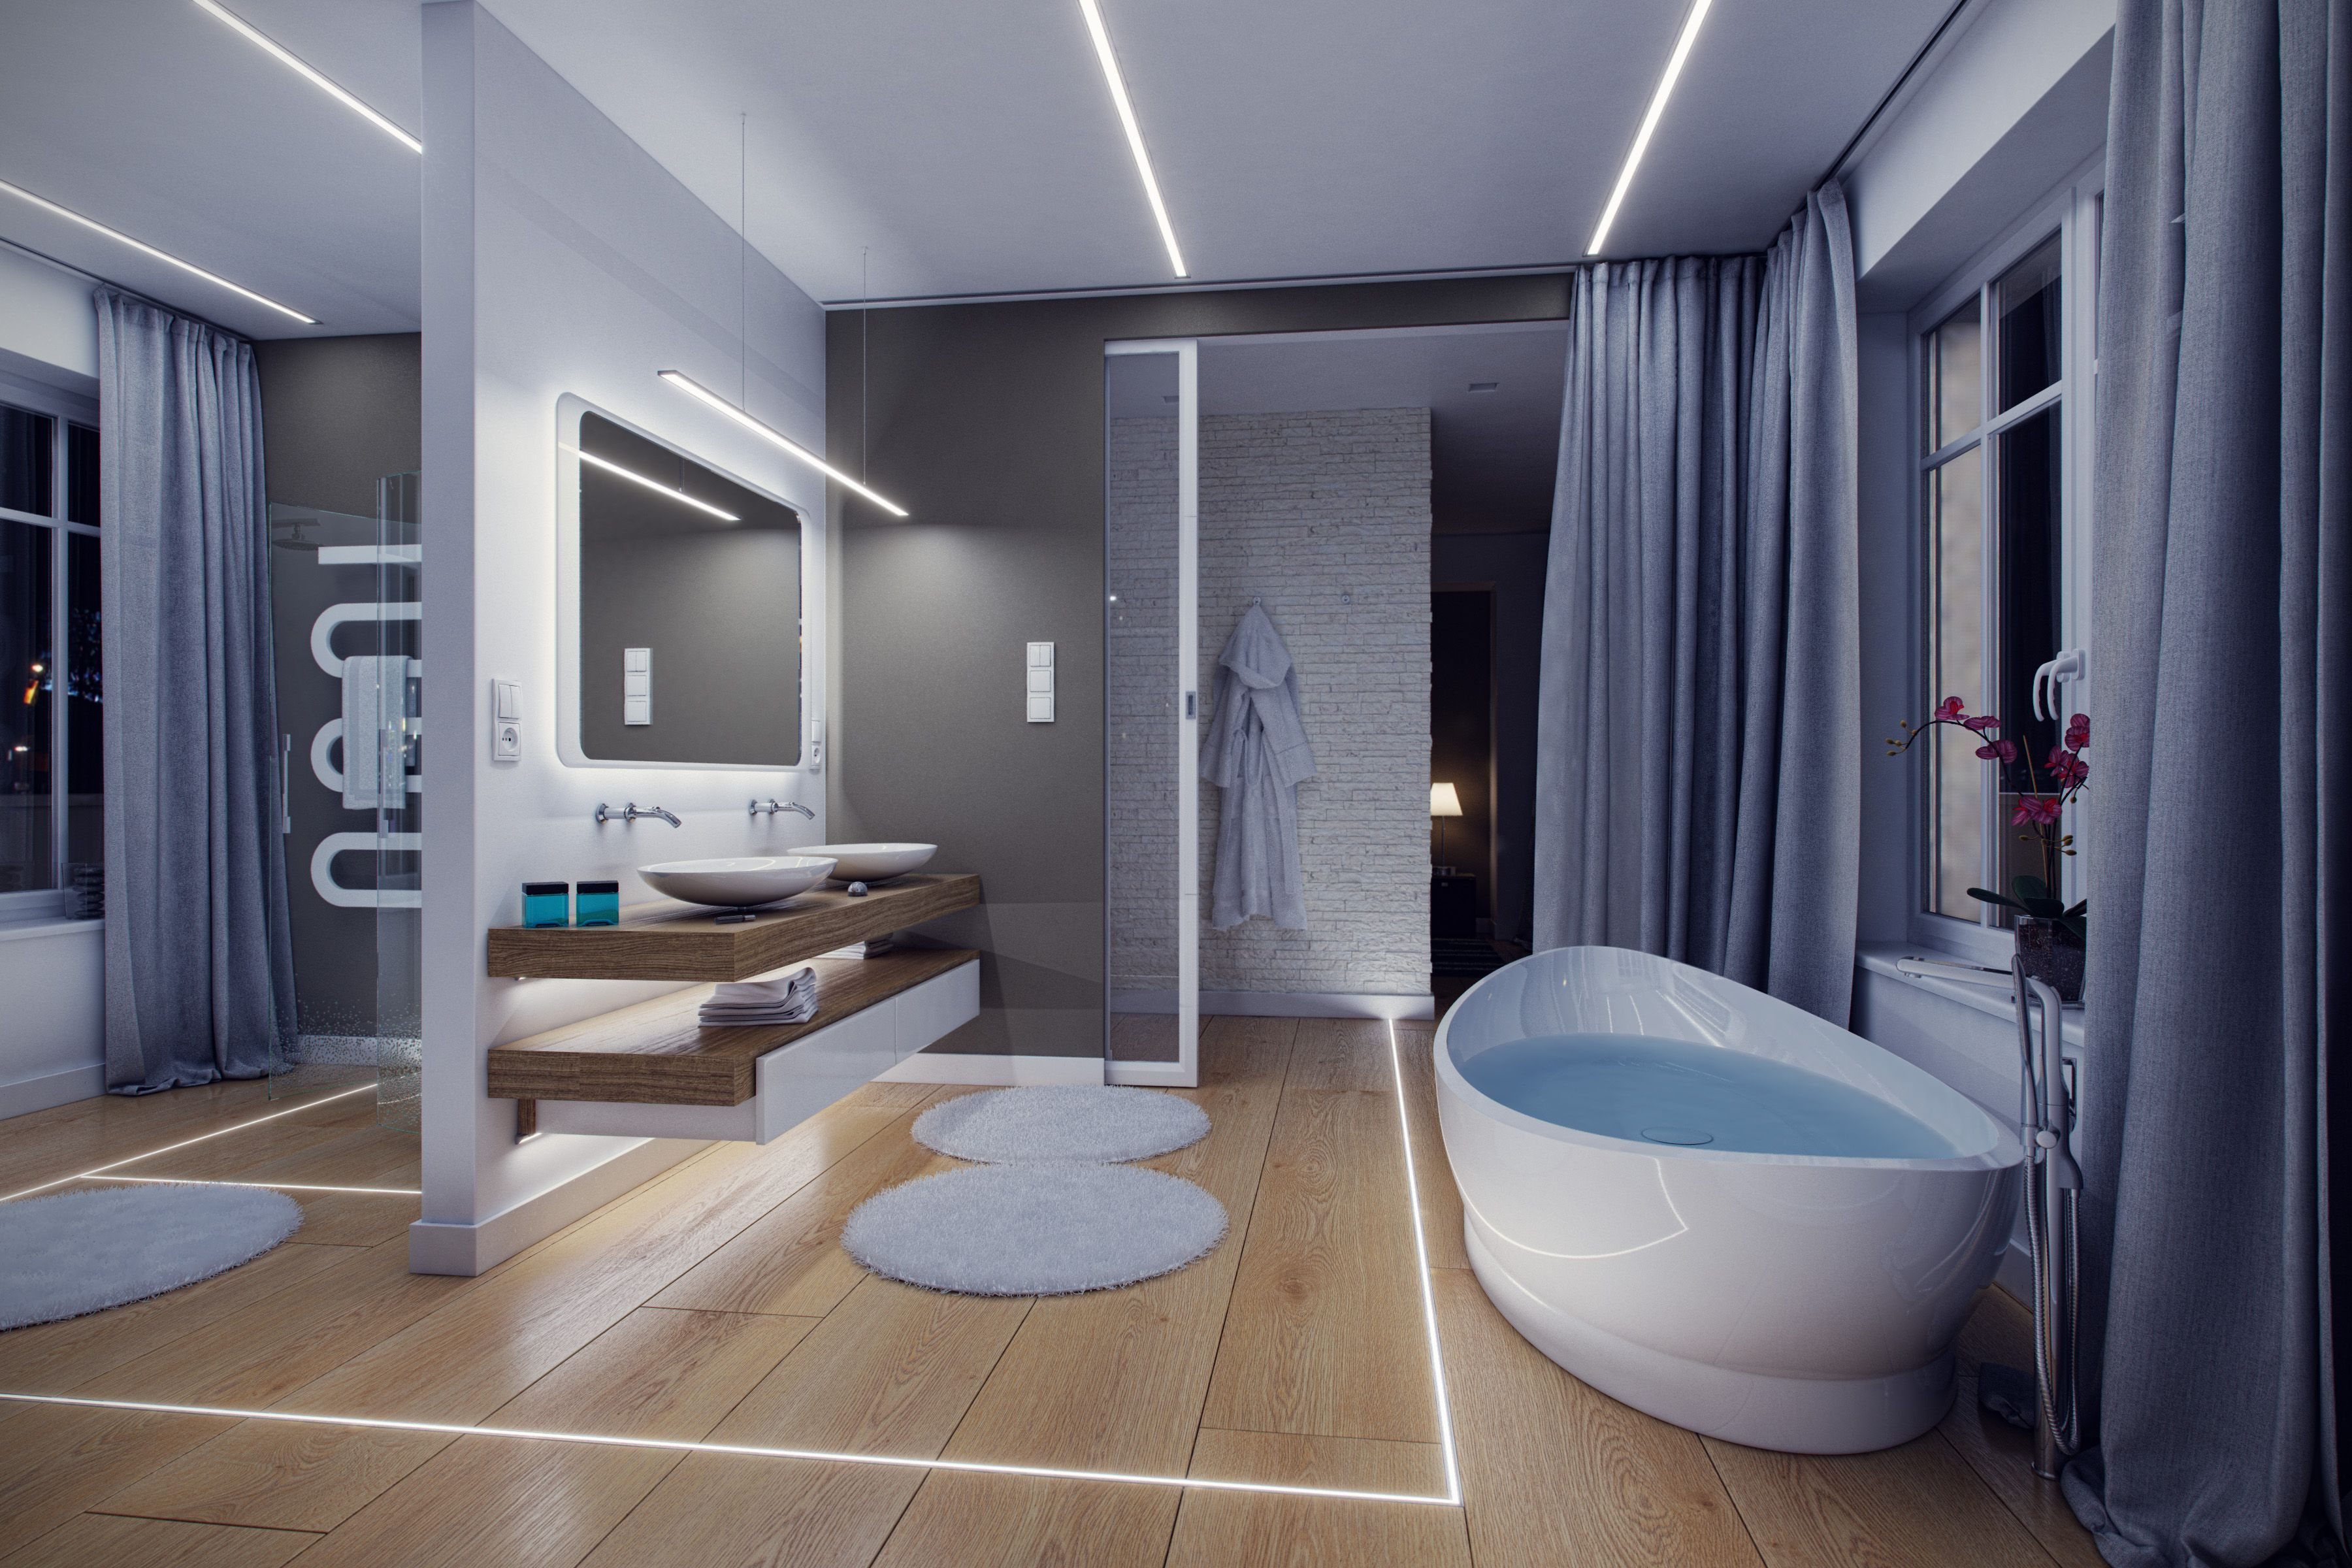 Floor Led Lighting For Bathroom Modern Bathroom Design Idea Profile Terra L Small Bathroom Interior Bathroom Design Mediterranean Bathroom Design Ideas